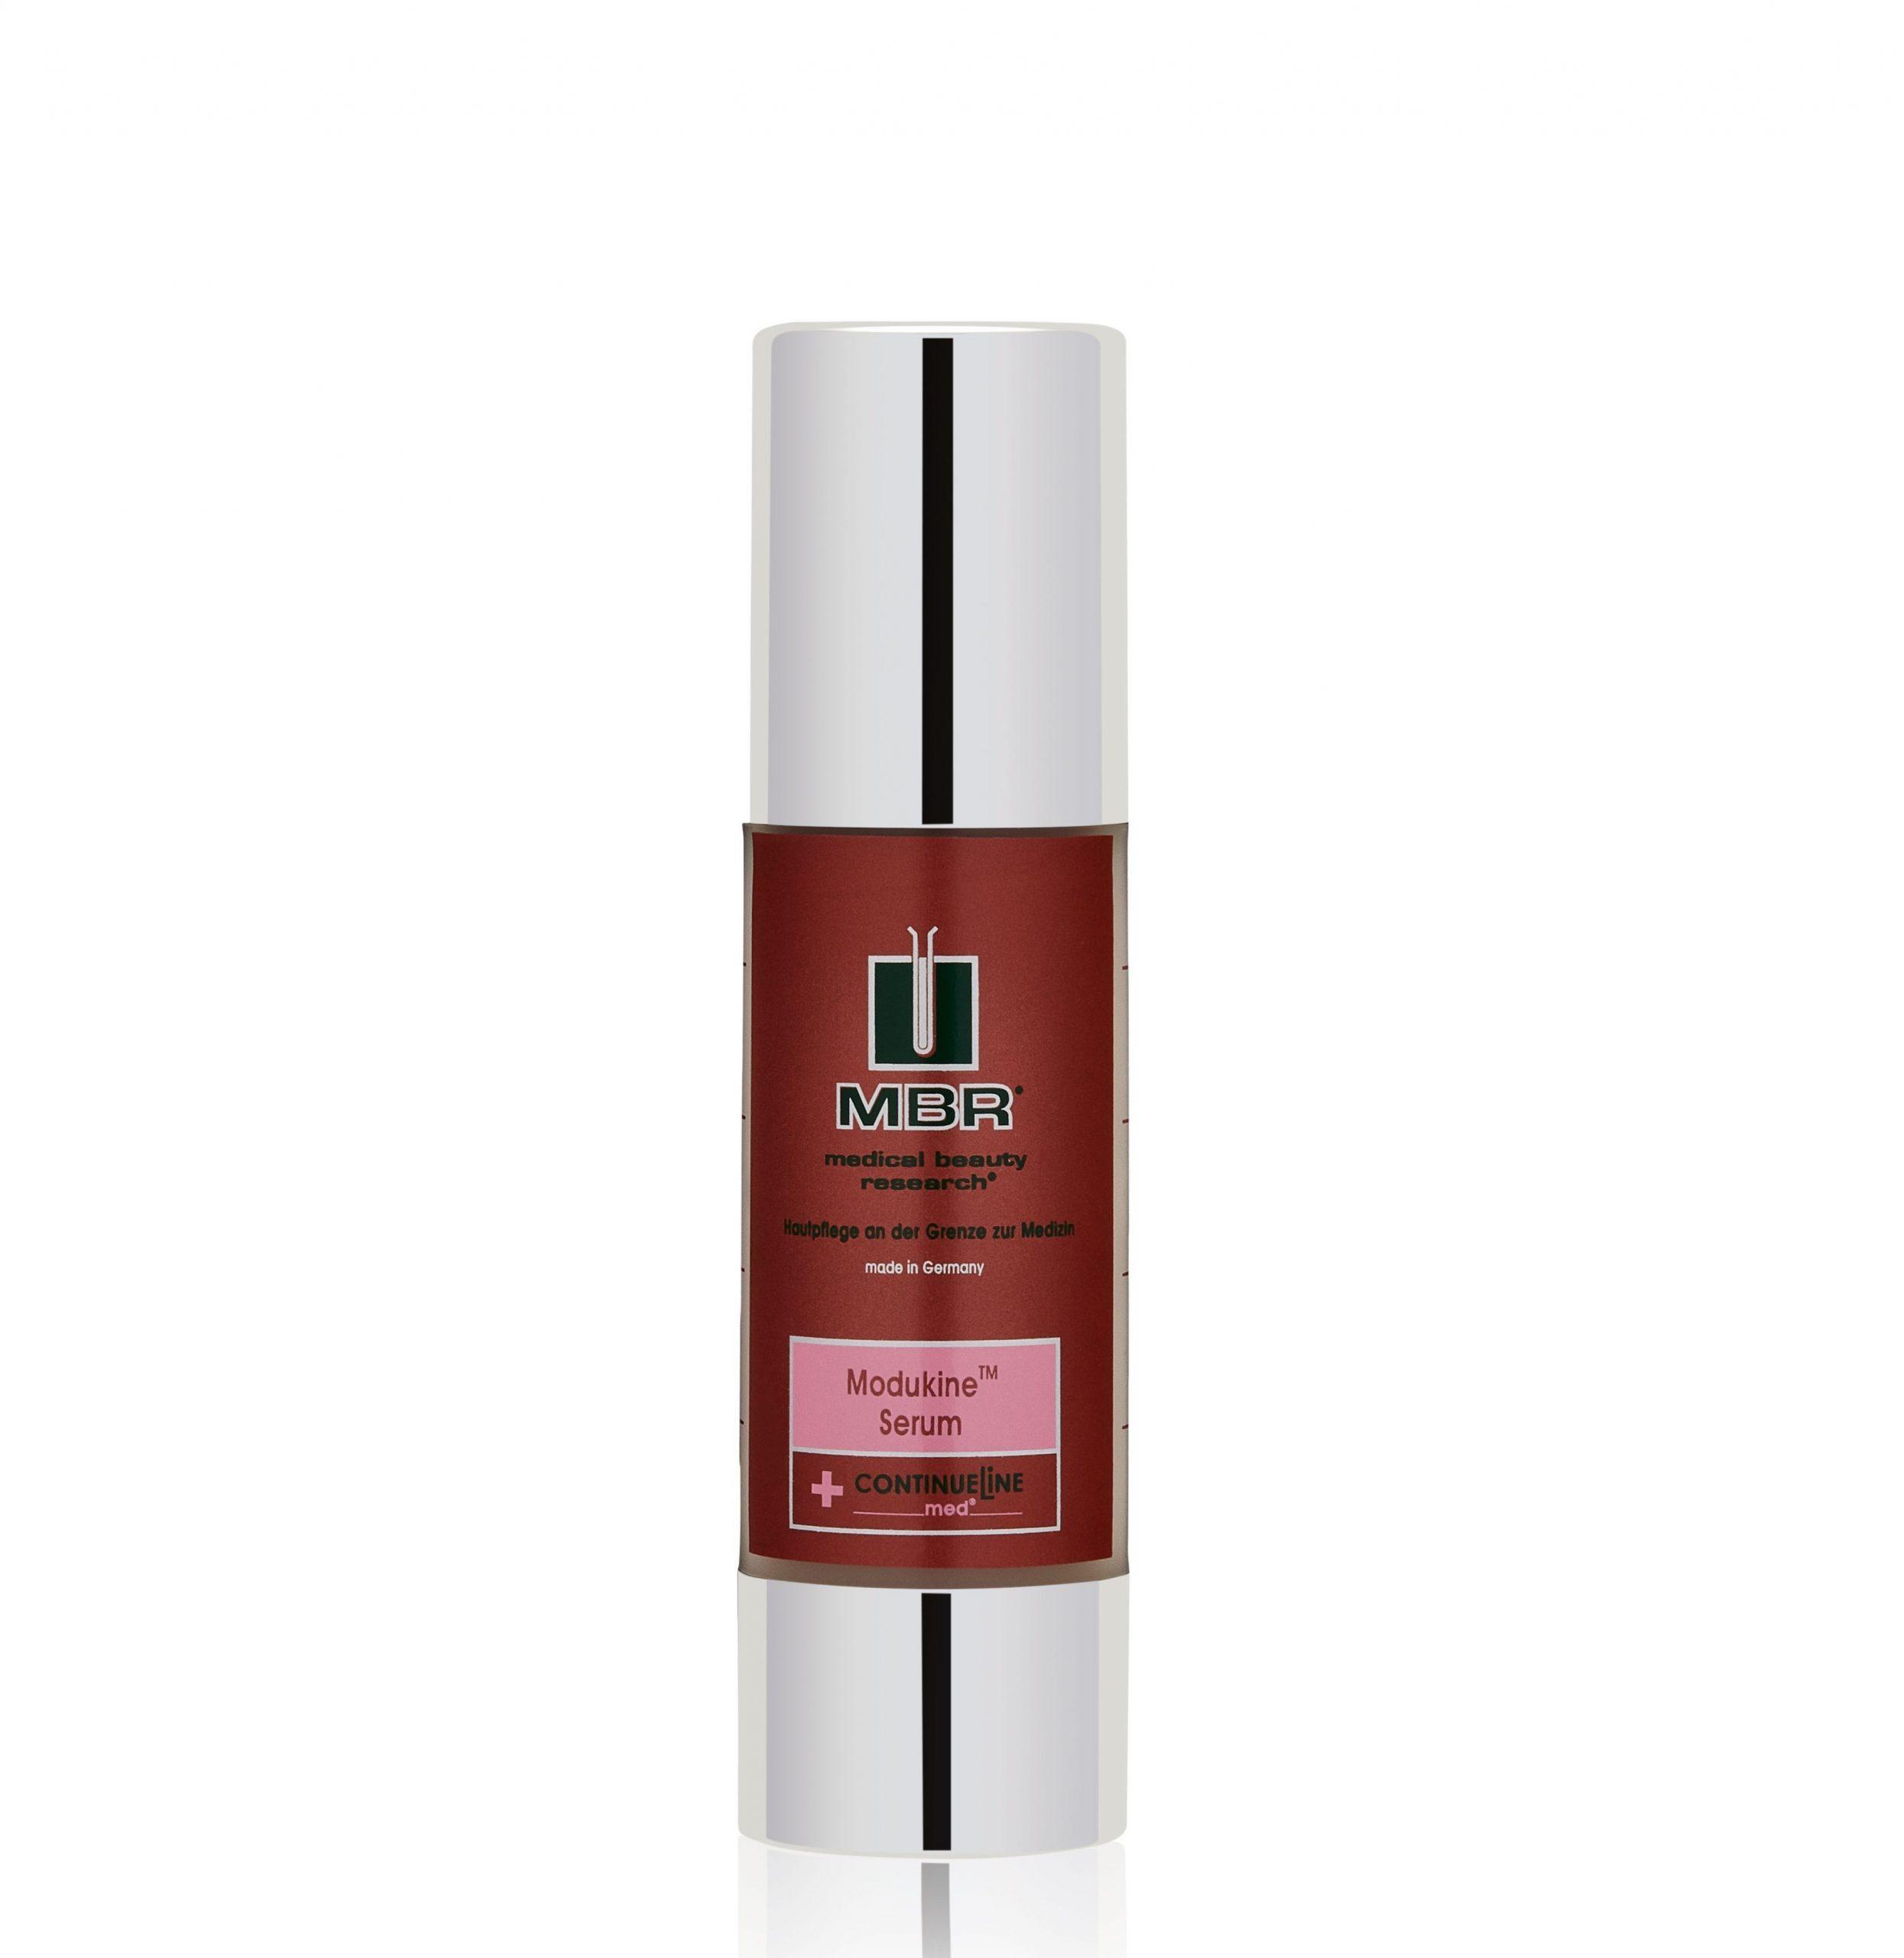 MBR-01530-ModukinTM-Serum-Product-1-e1553102694845